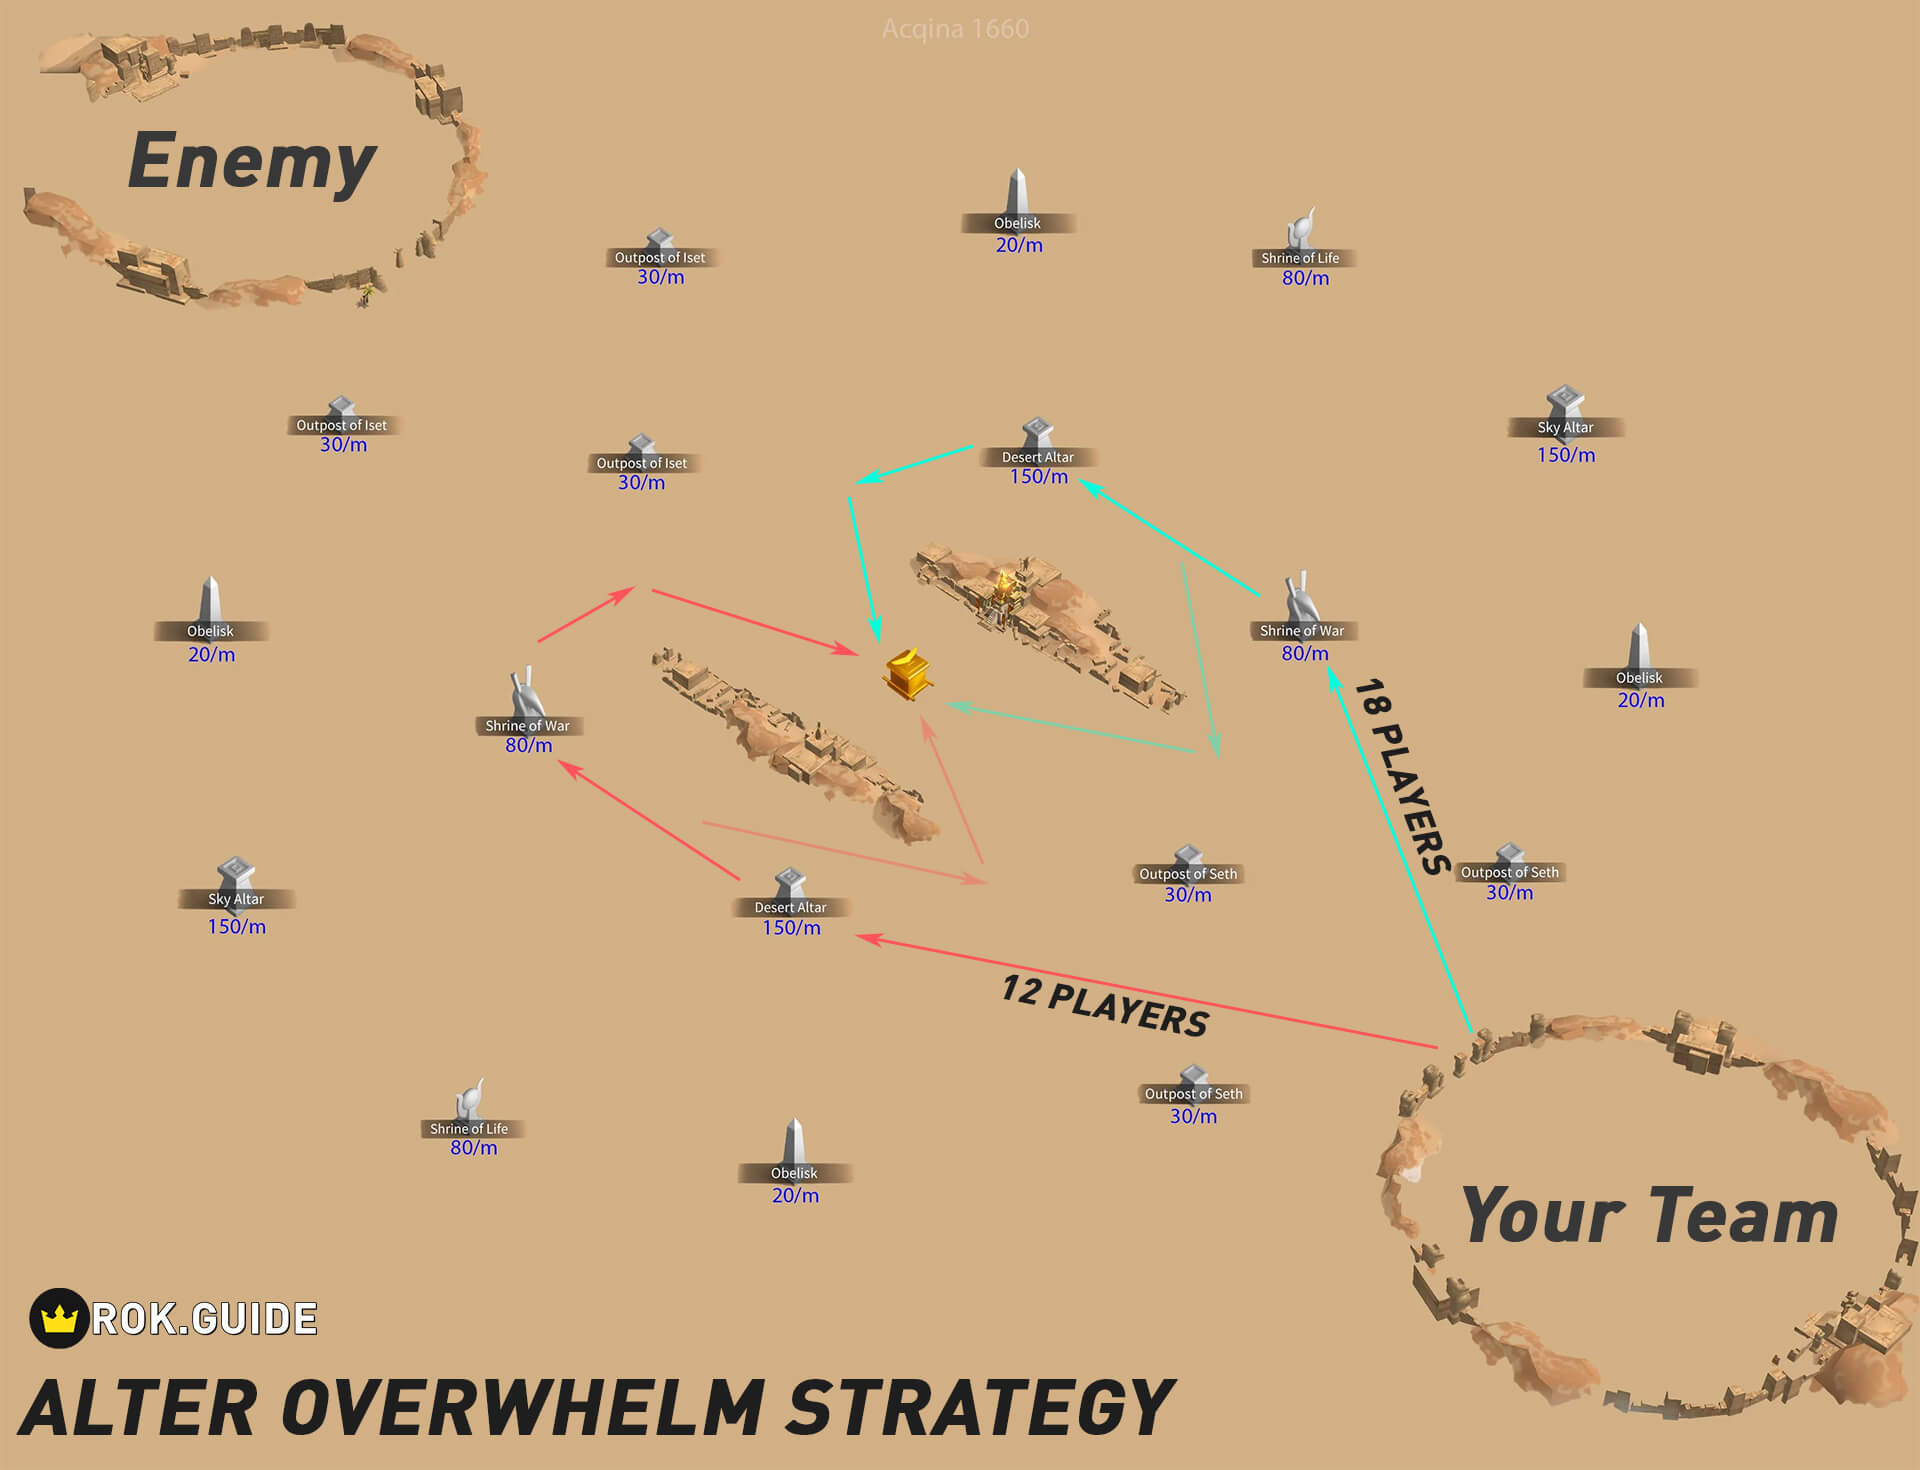 ark of osiris alter overwhelm strategy